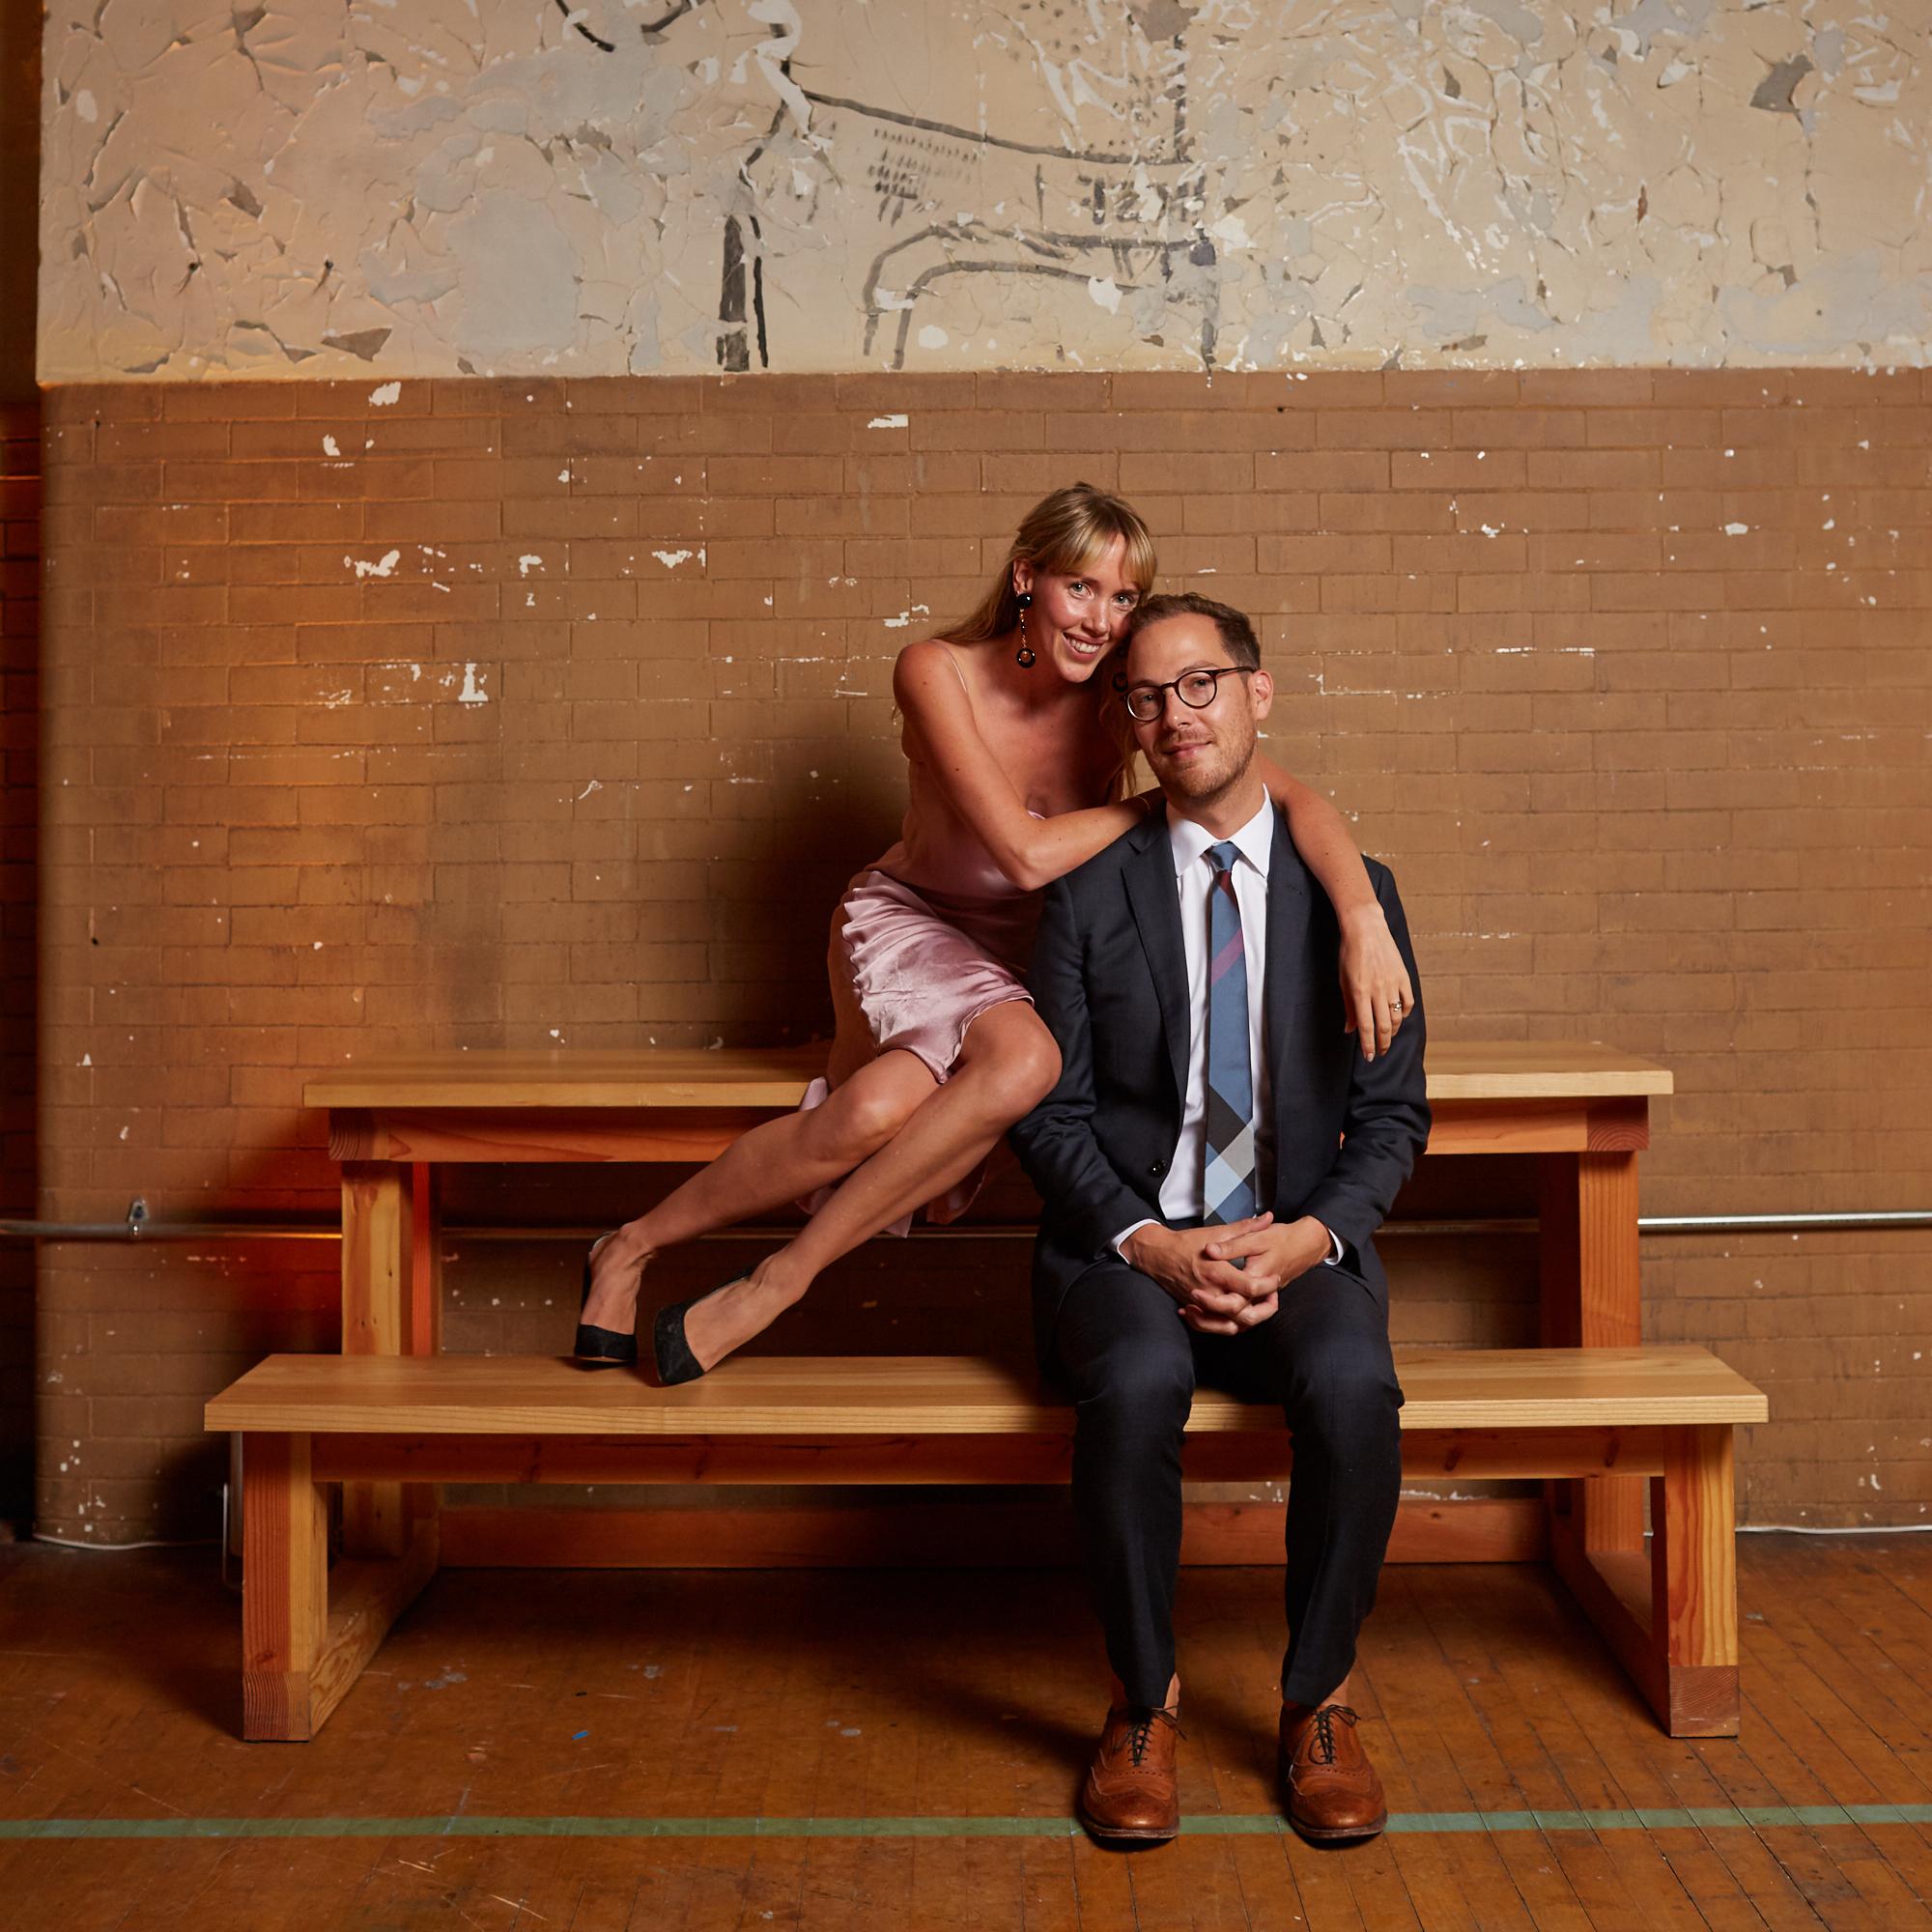 Ryan Hannah Sims - 2017.09 - Wedding Photos - 958.jpg